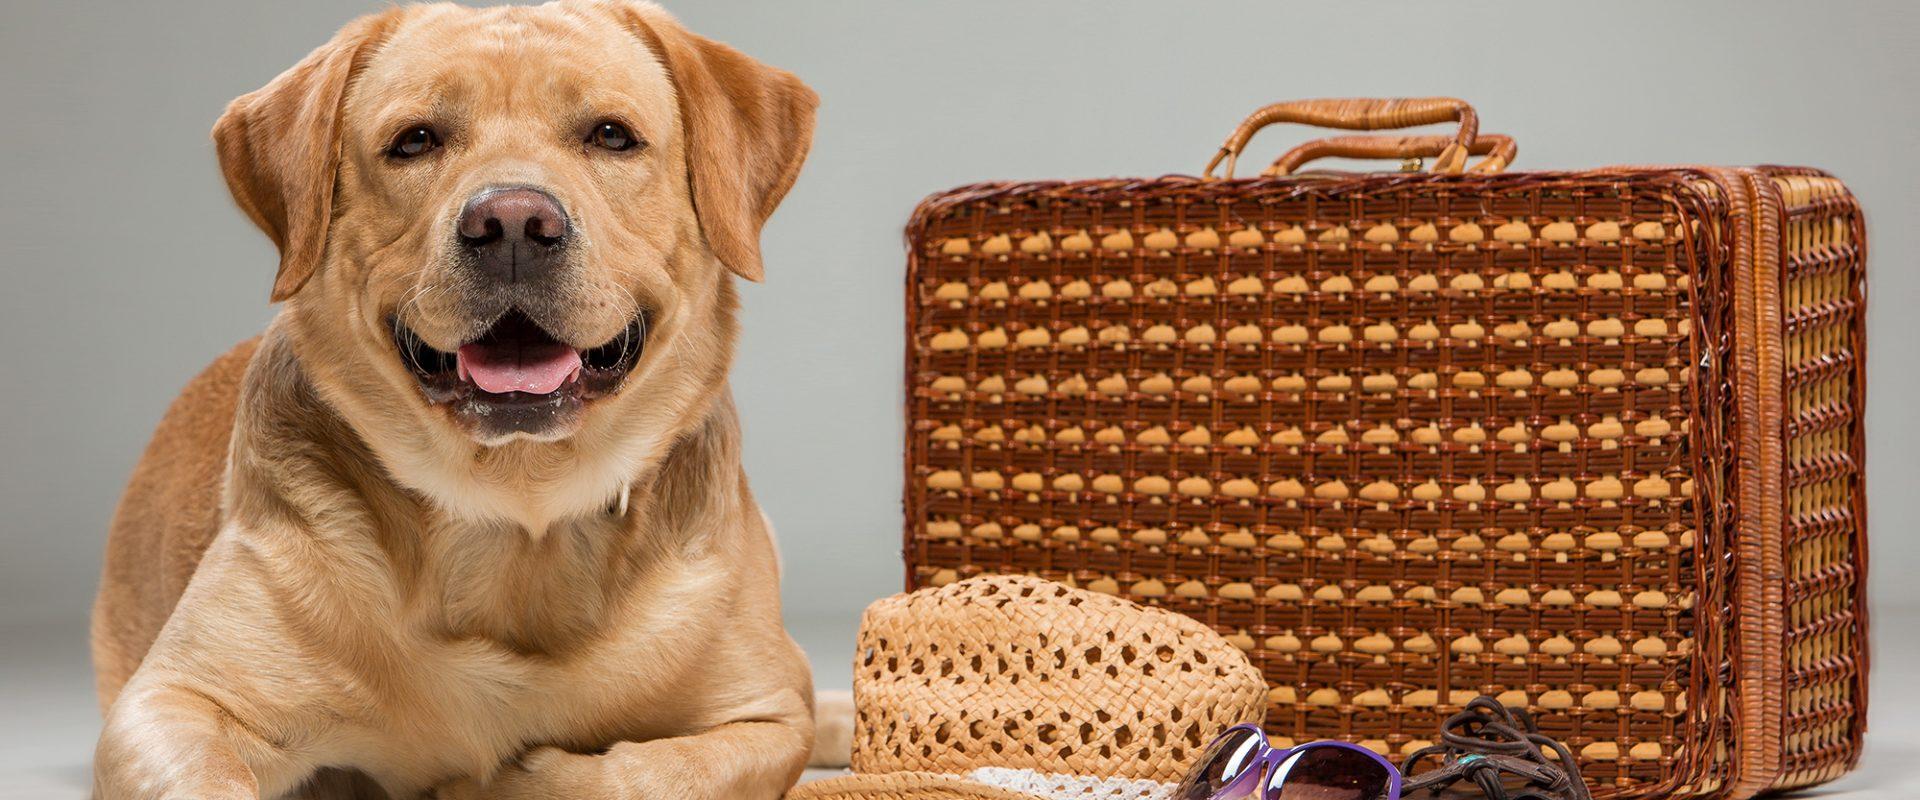 Pet Friendly Accommodations